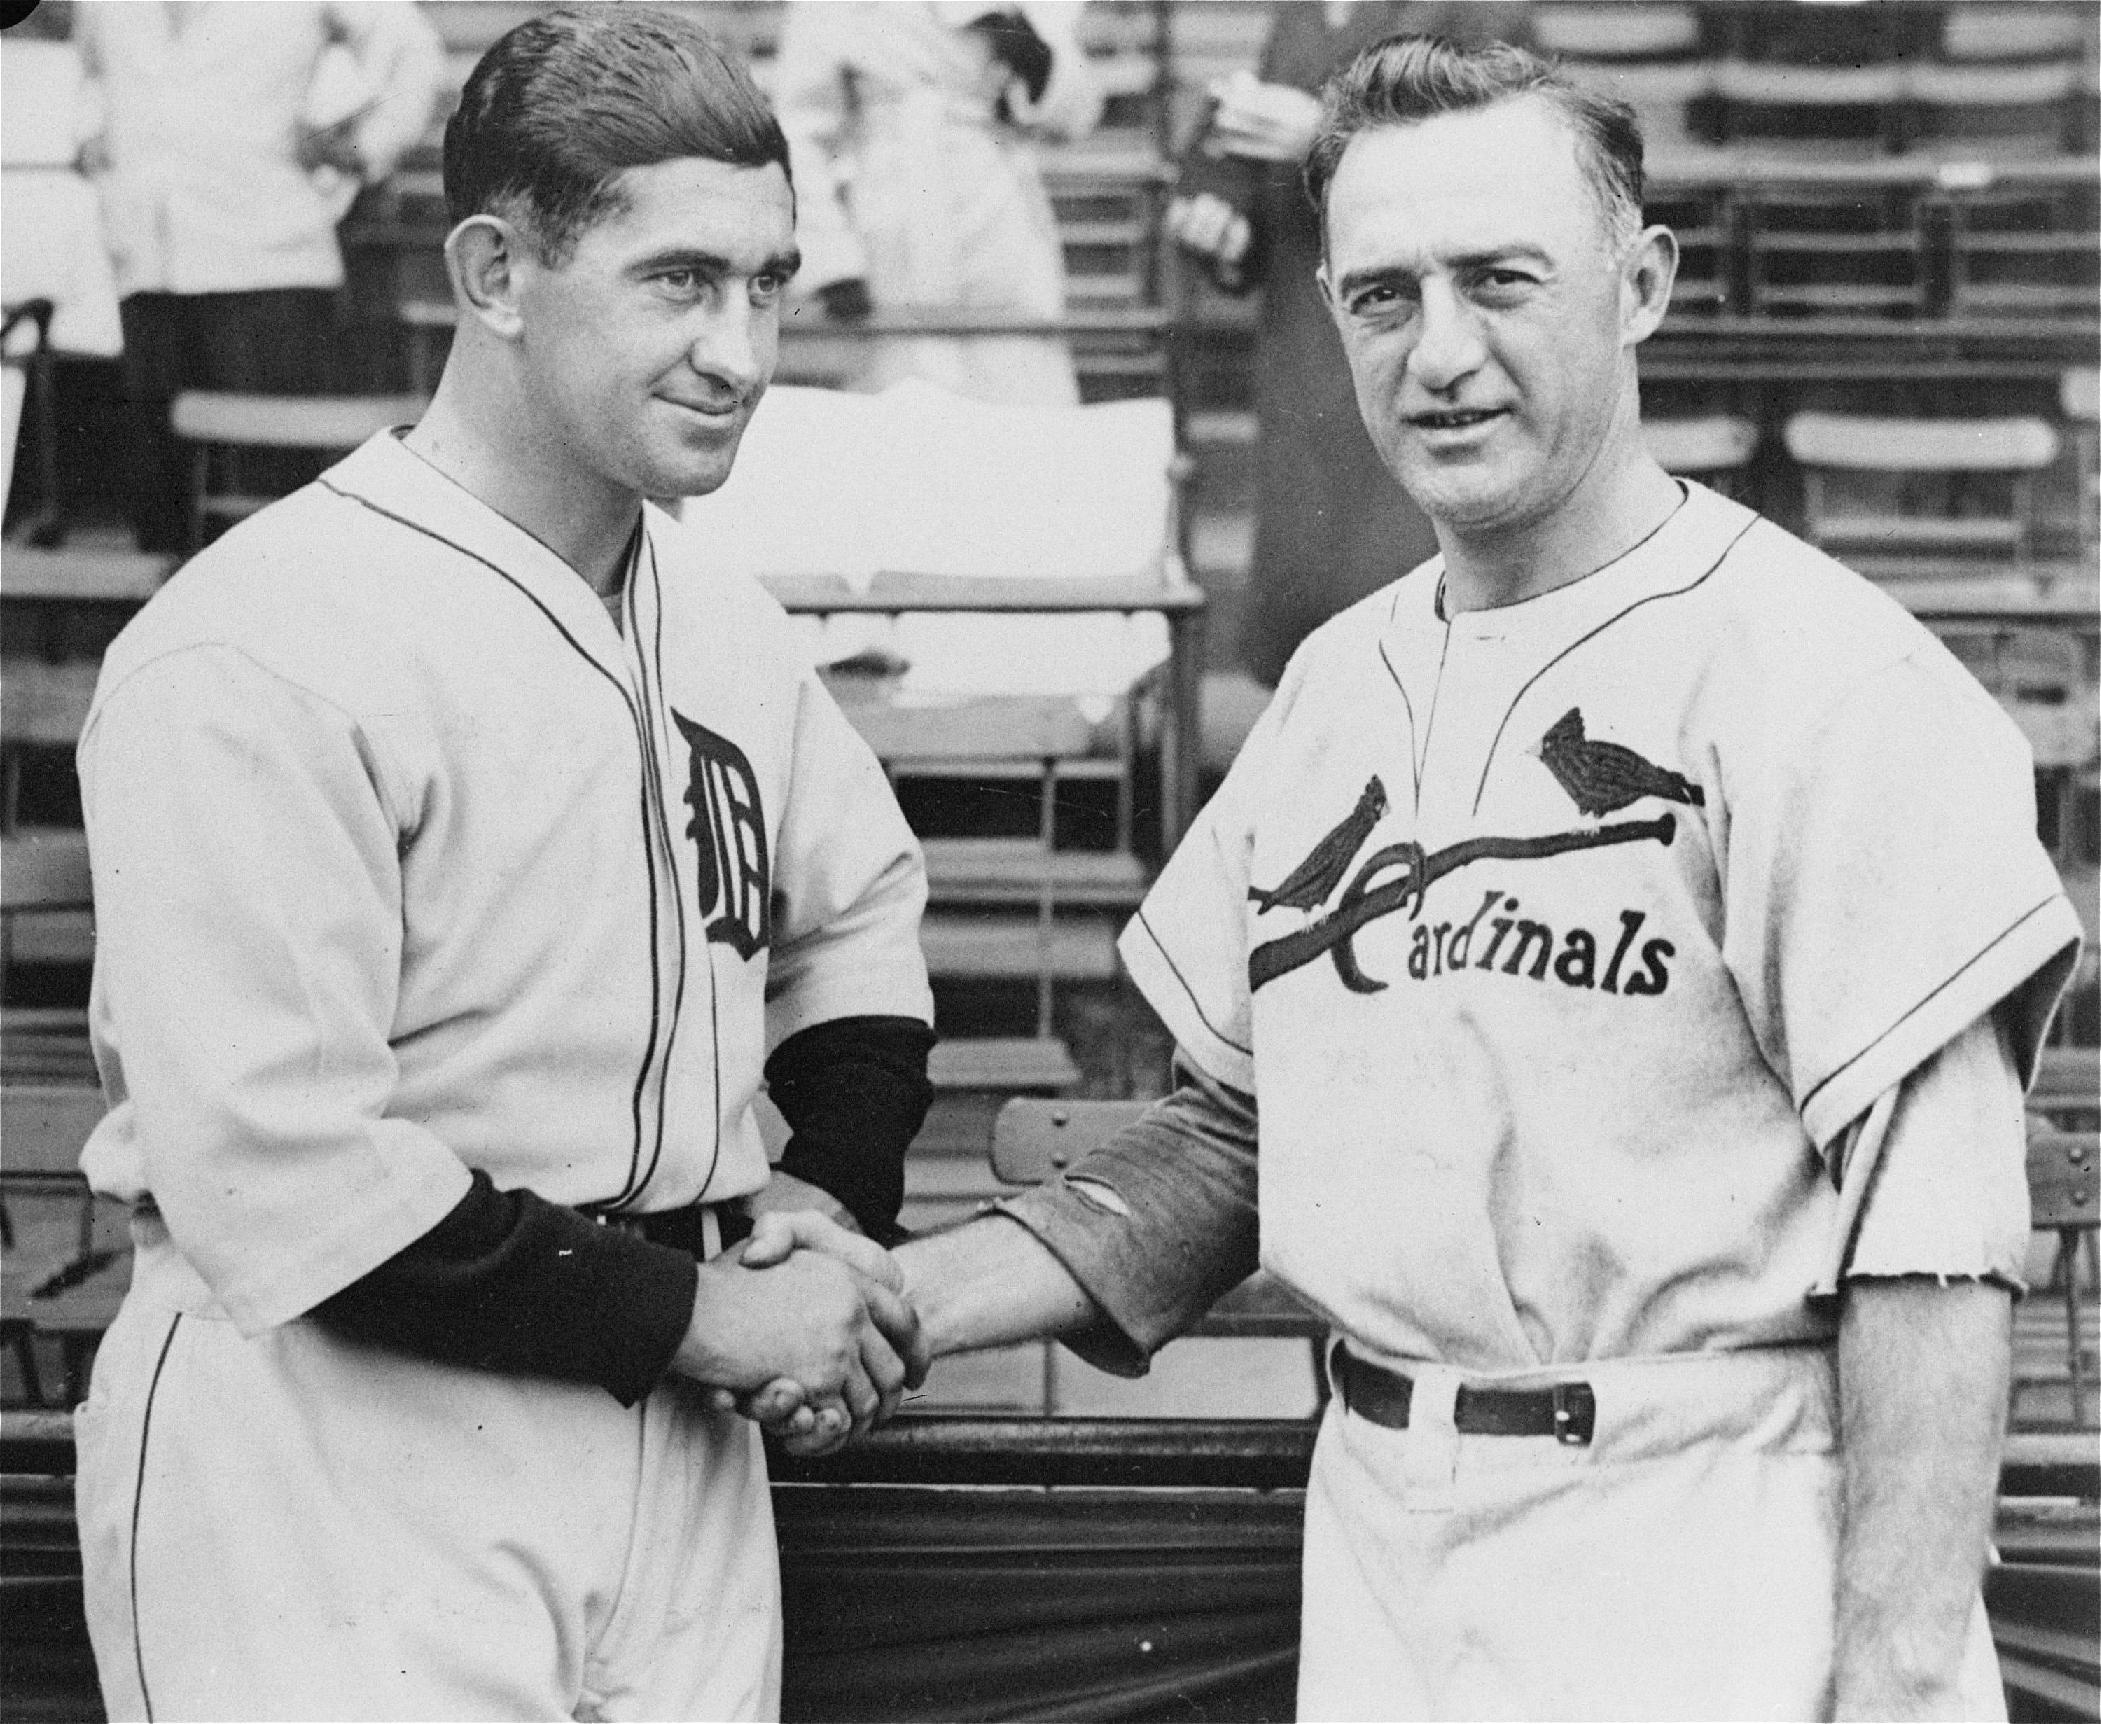 Cards, Dodgers, Tigers, Bosox sport longtime logos